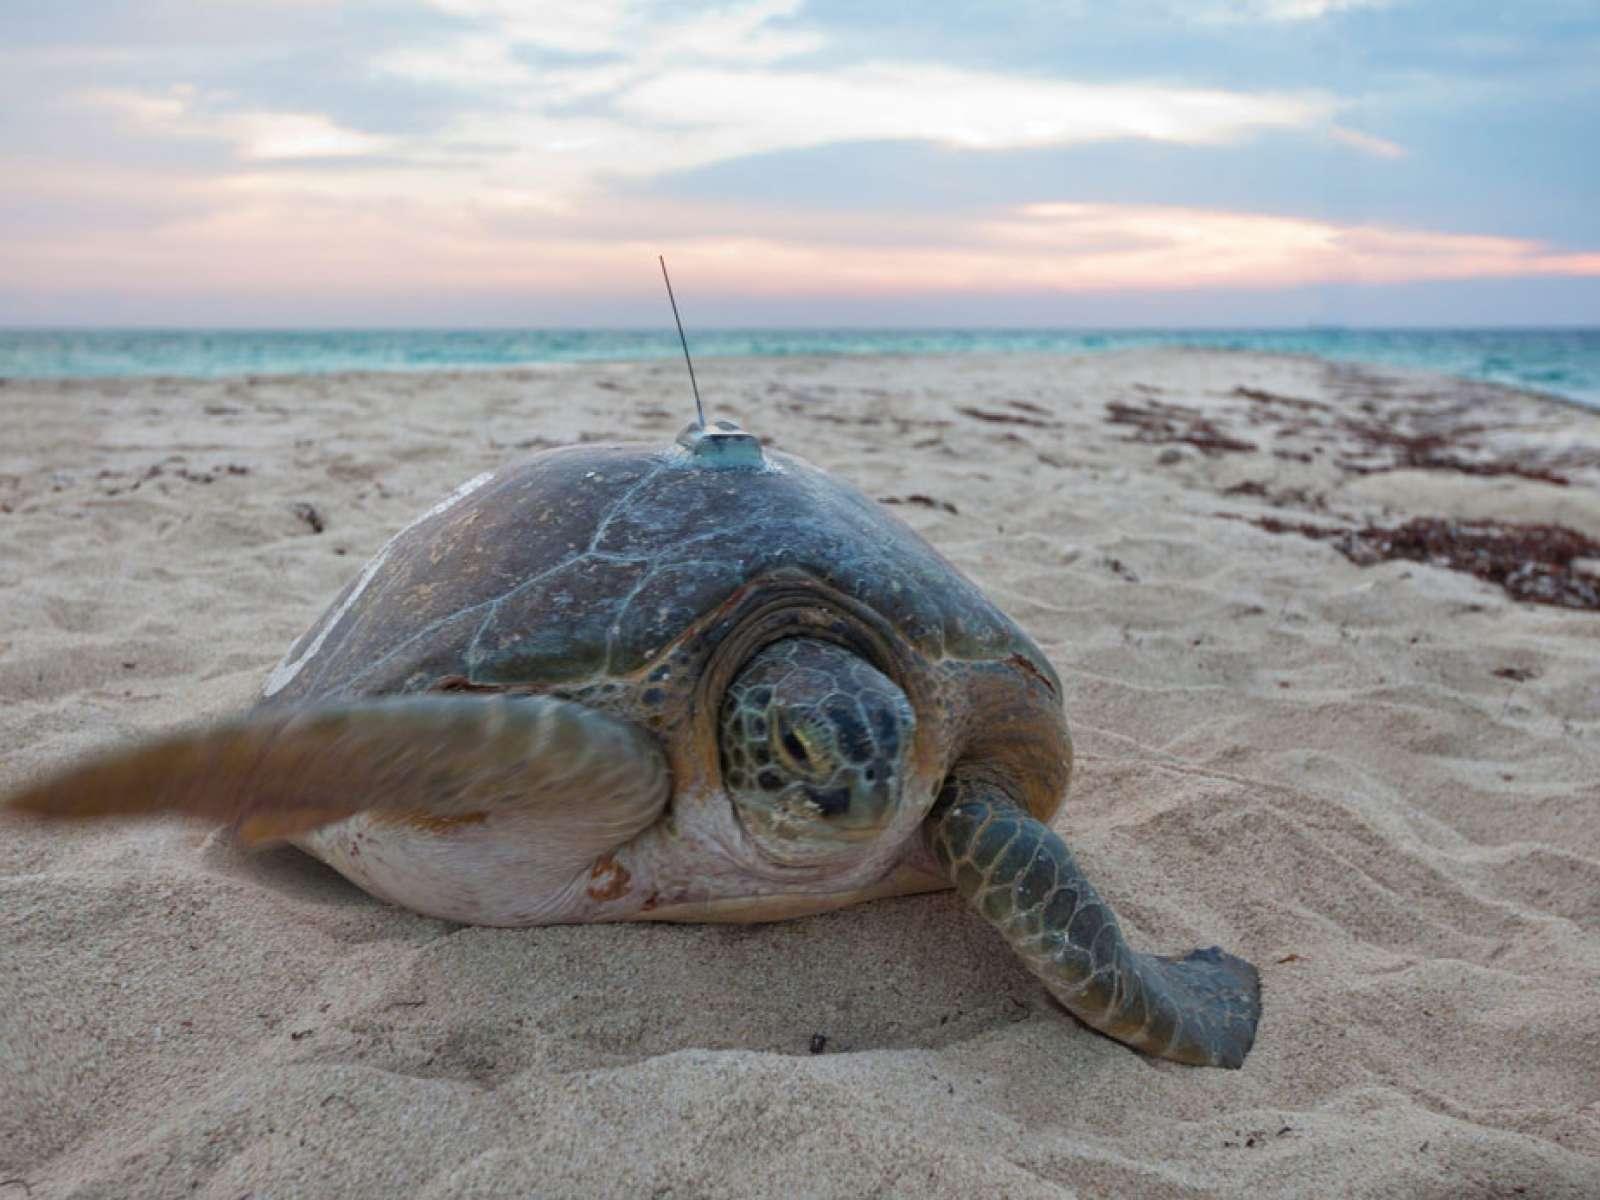 Tracking green sea turtles, Dry Tortugas National Park, Florida Keys